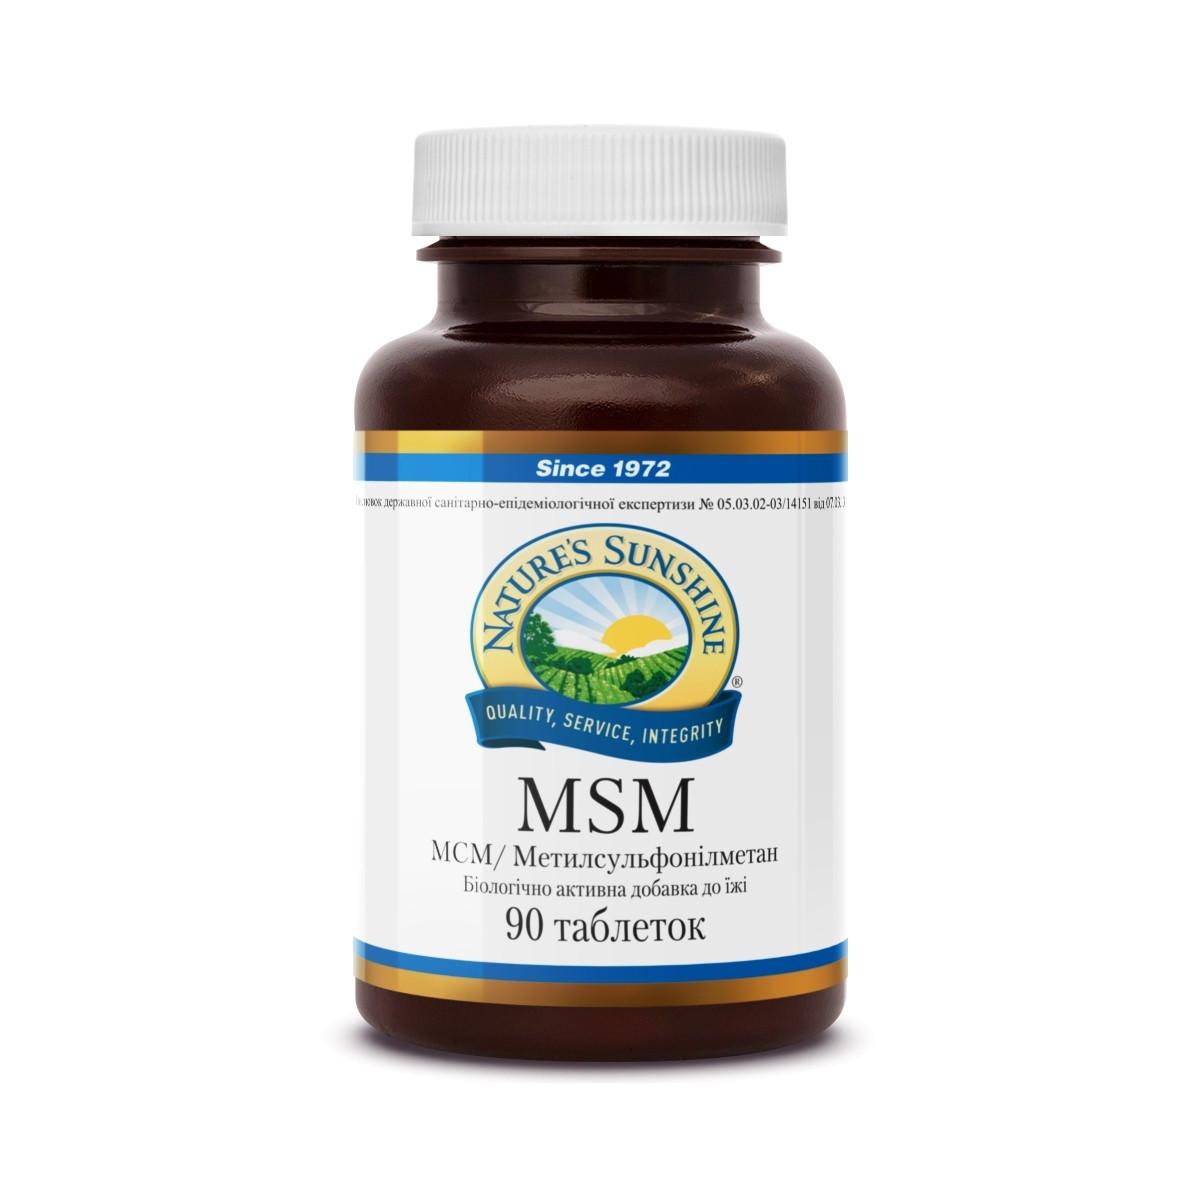 Сера. MSM бад НСП. для очистки кожи.